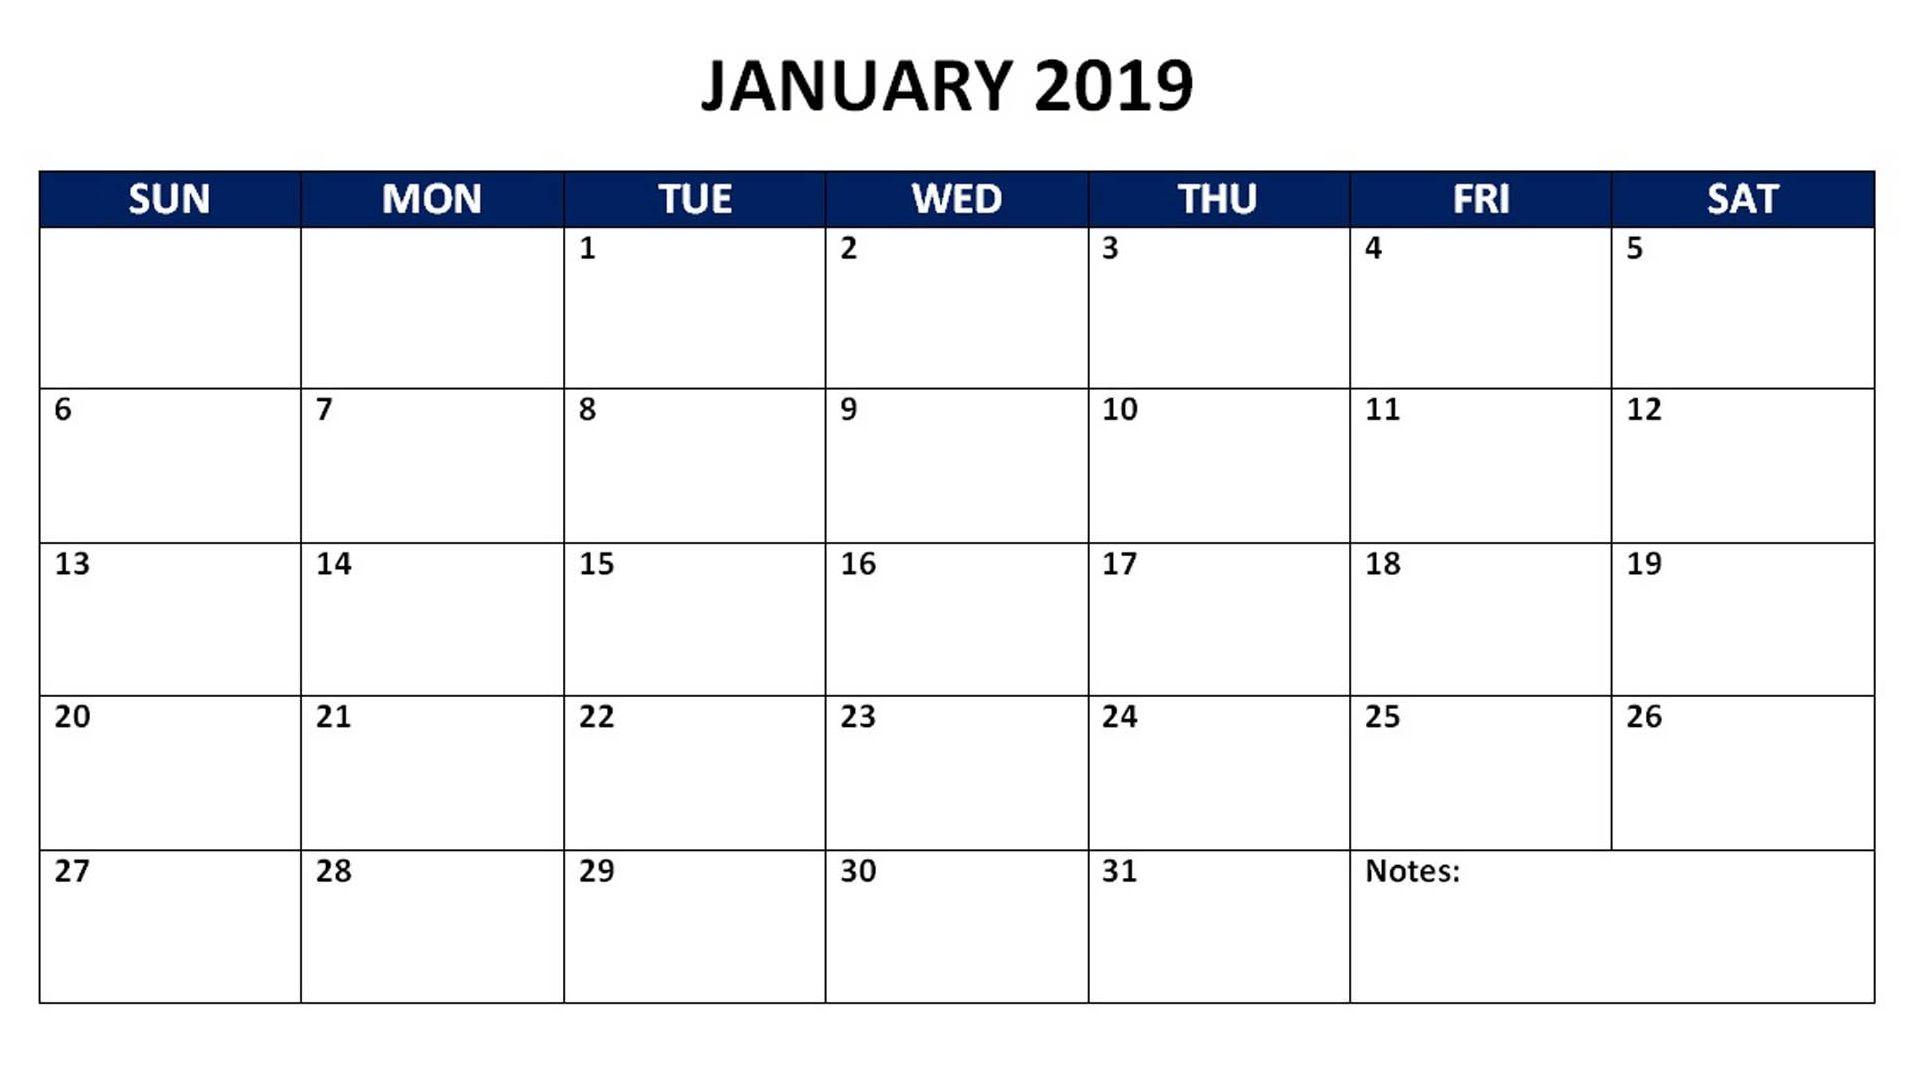 January 2019 Monthly Calendar 2019 Calendars Pinterest